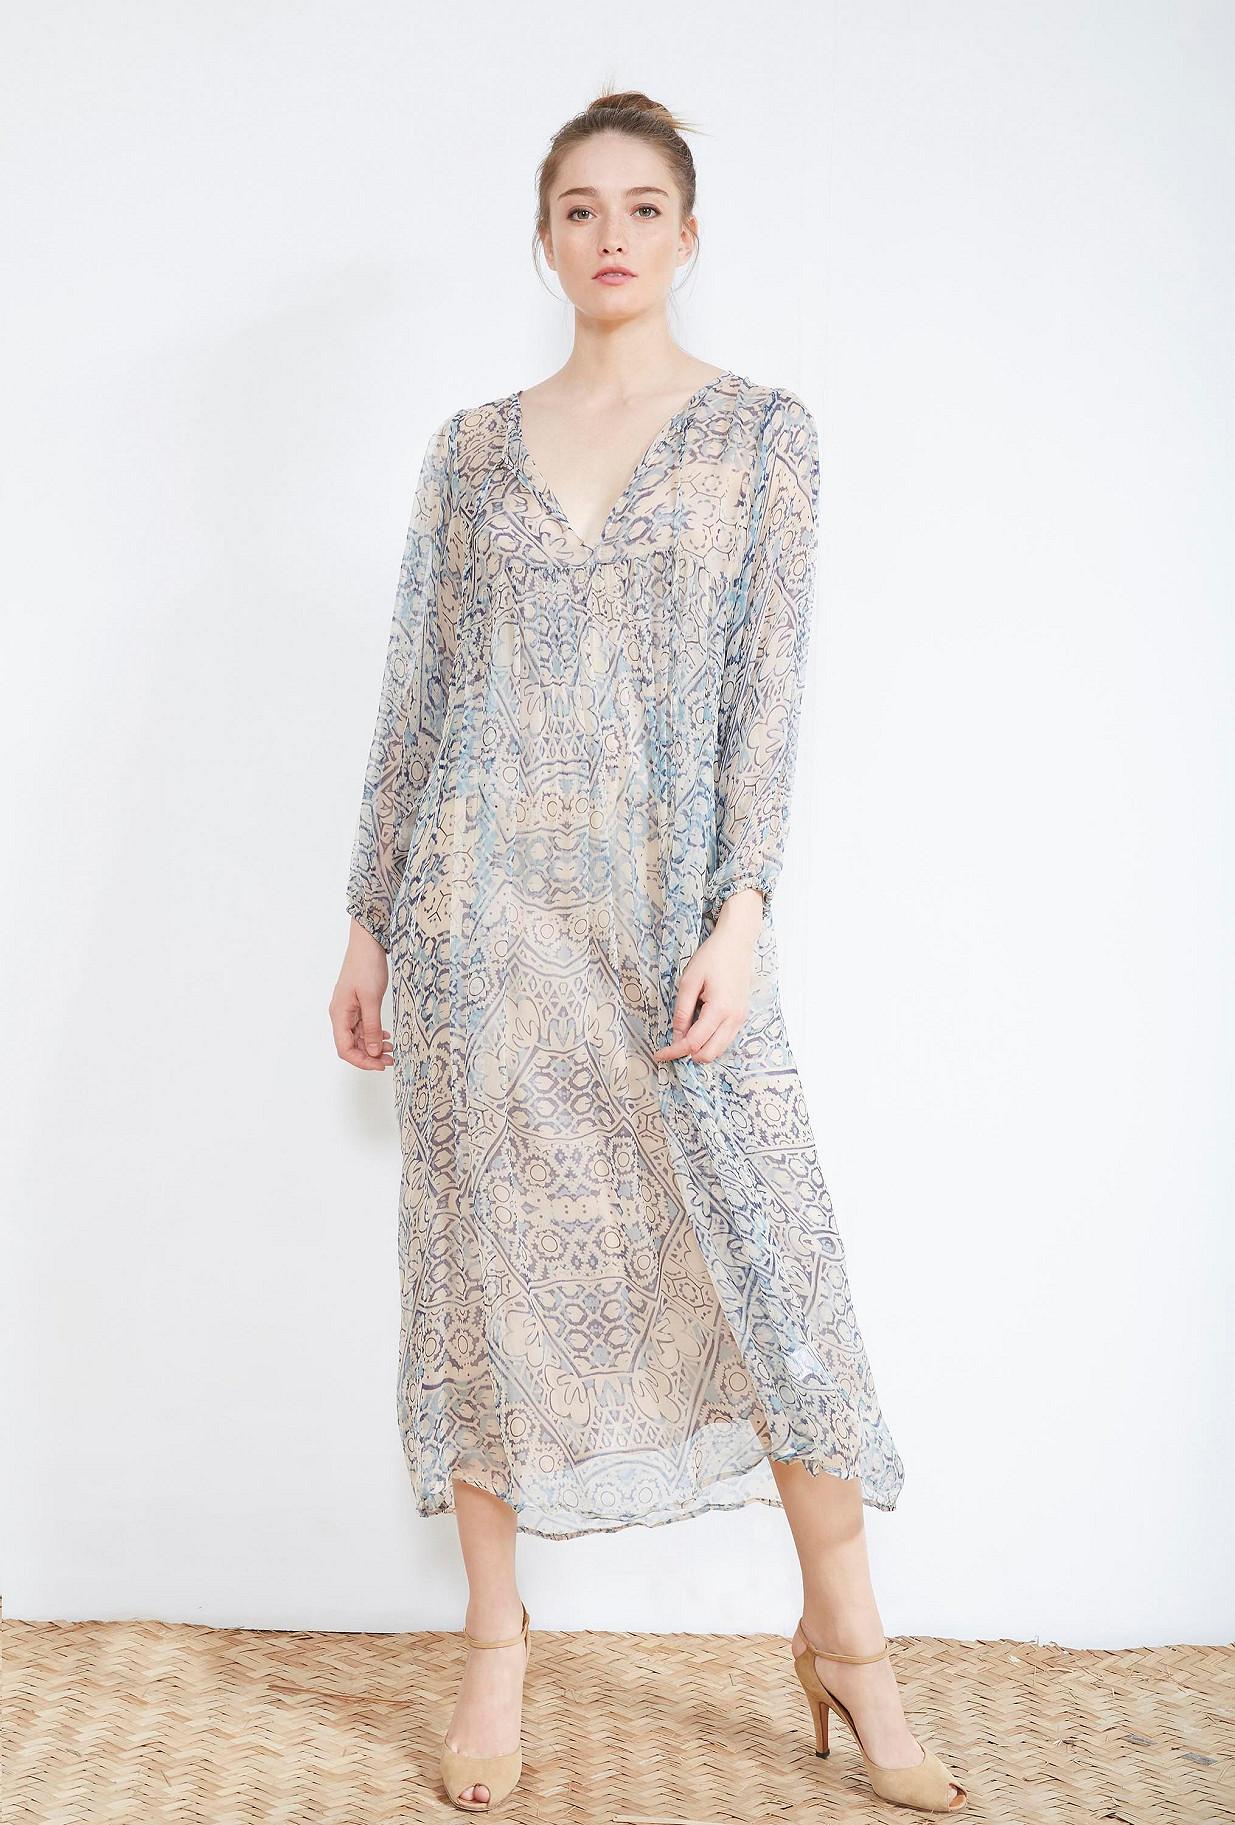 Blue print DRESS Feydeau Mes Demoiselles Paris